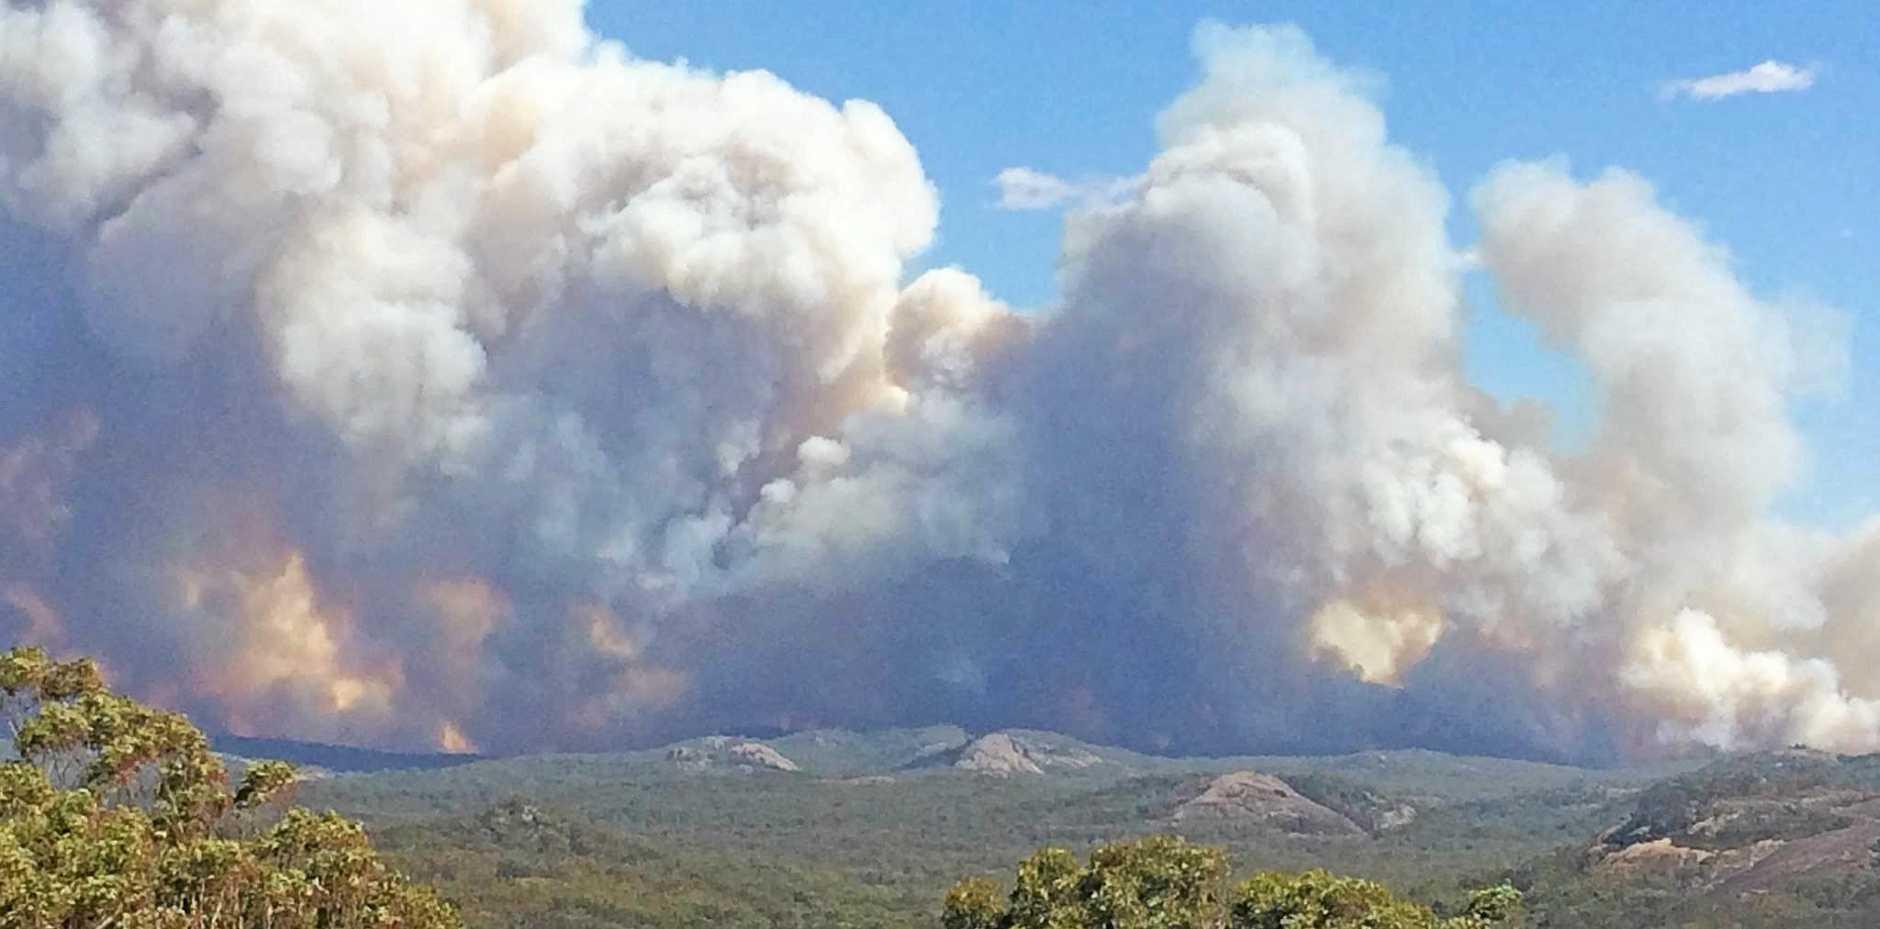 Wallangarra fire burns off in the distance.